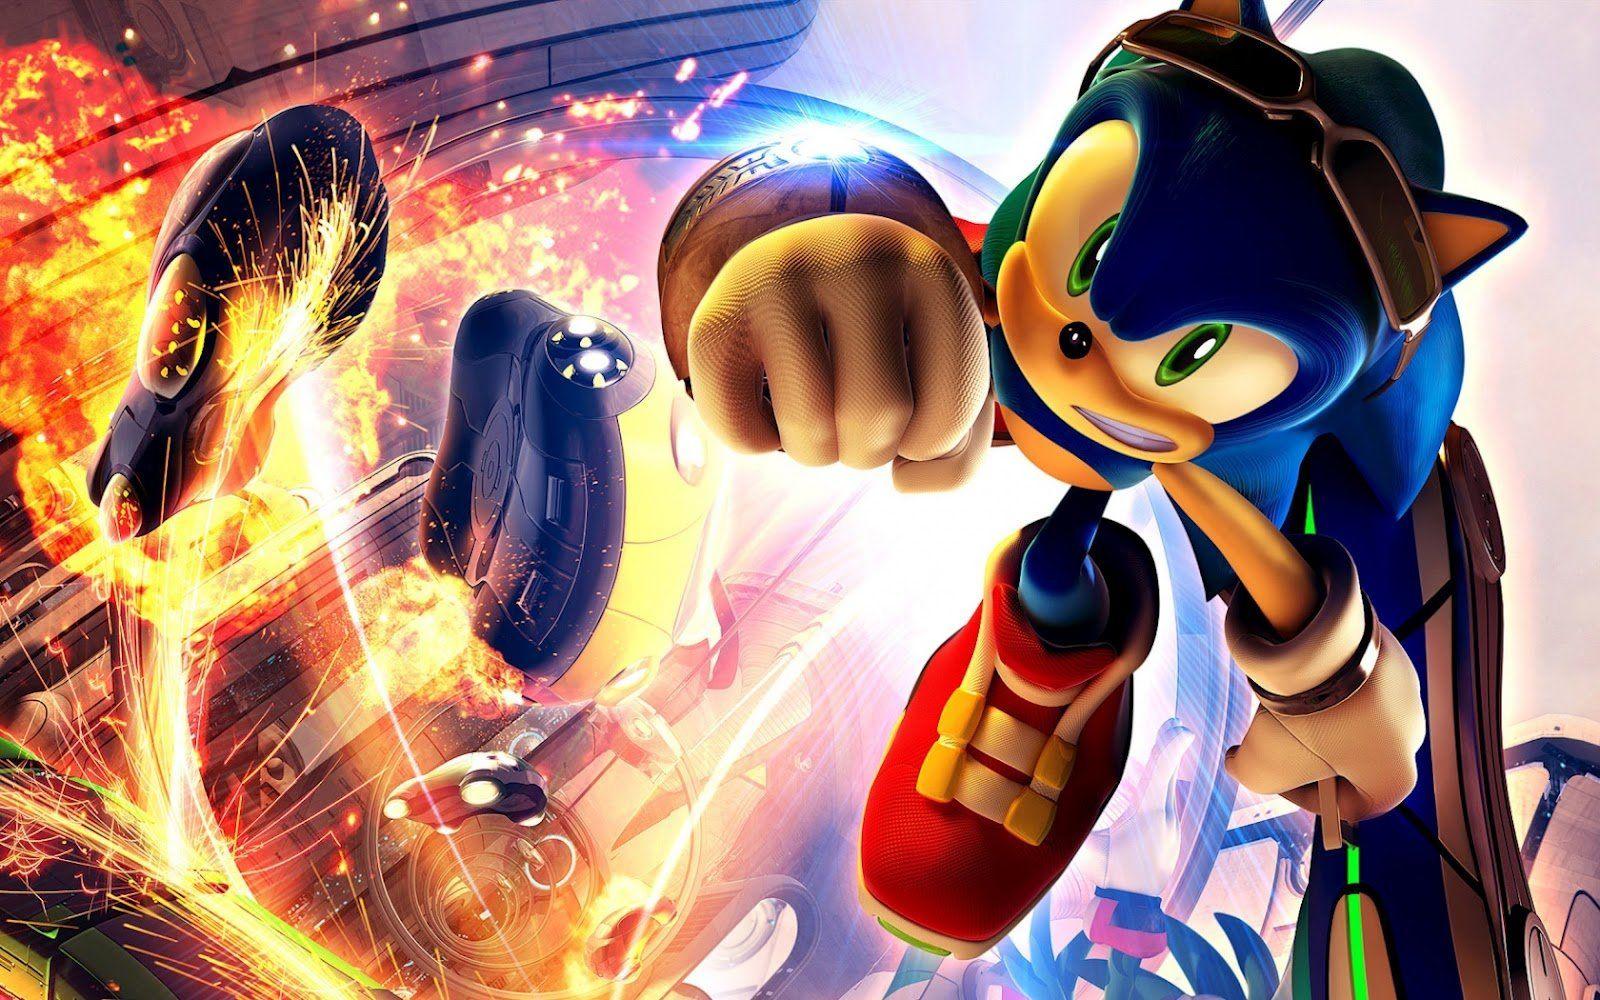 Happy Birthday Sonic The Hedgehog The House Next Door Slant Sonic The Hedgehog Gaming Wallpapers Sonic